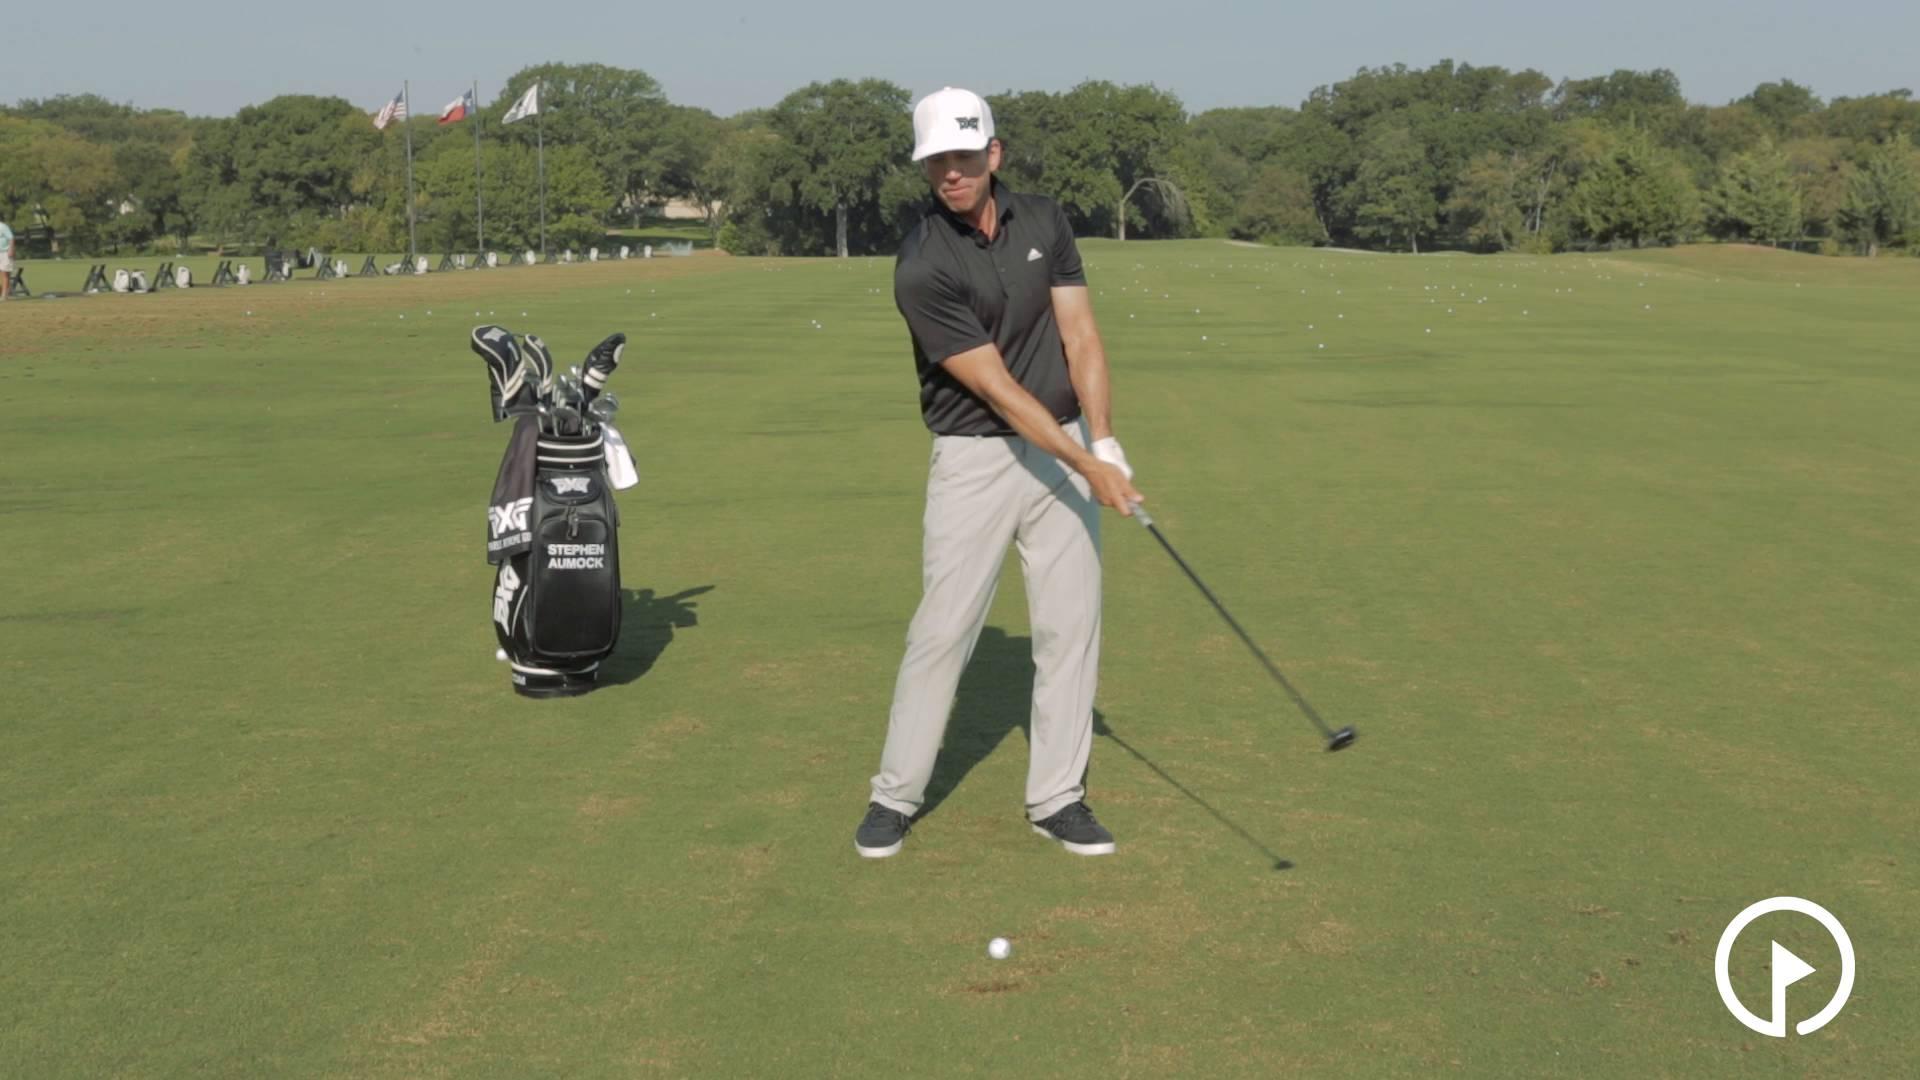 Should You Pause at the Top Like Hideki Matsuyama?